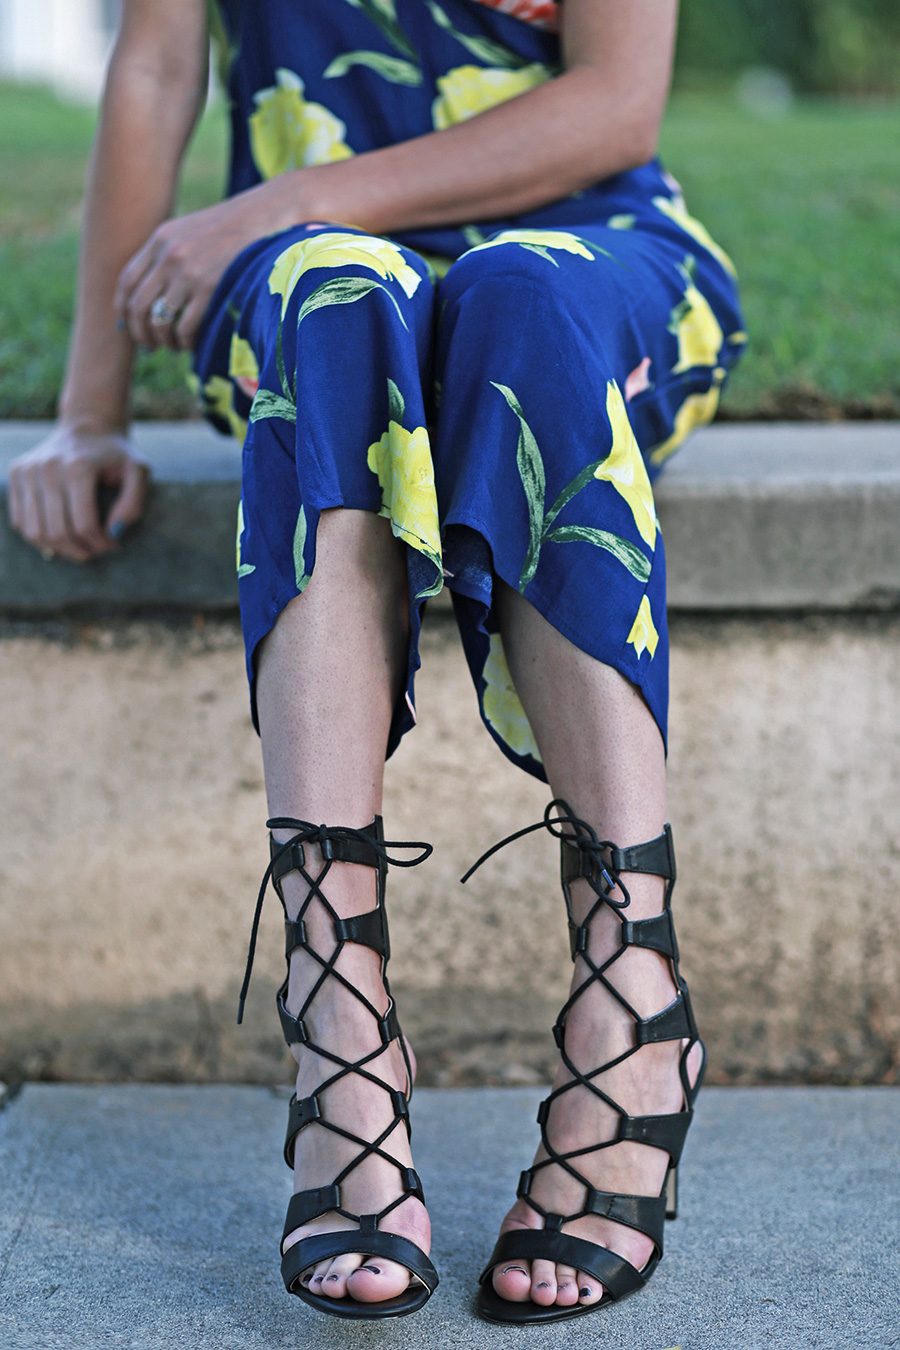 forever21 floral jumpsuit call it spring black heels 10